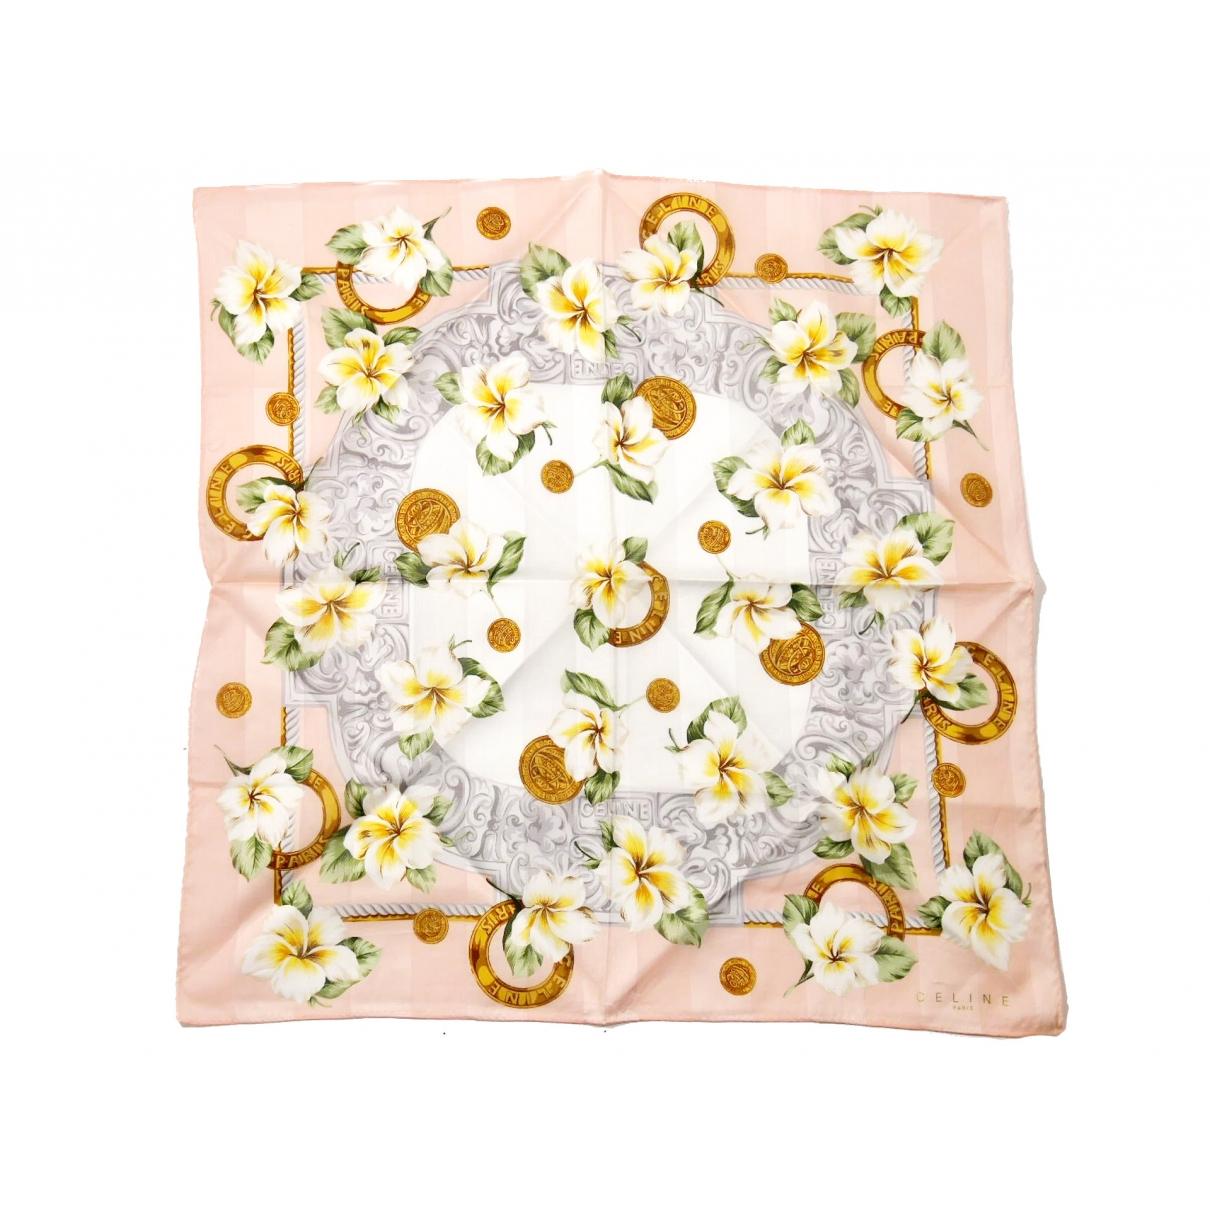 Celine \N Linen scarf for Women \N